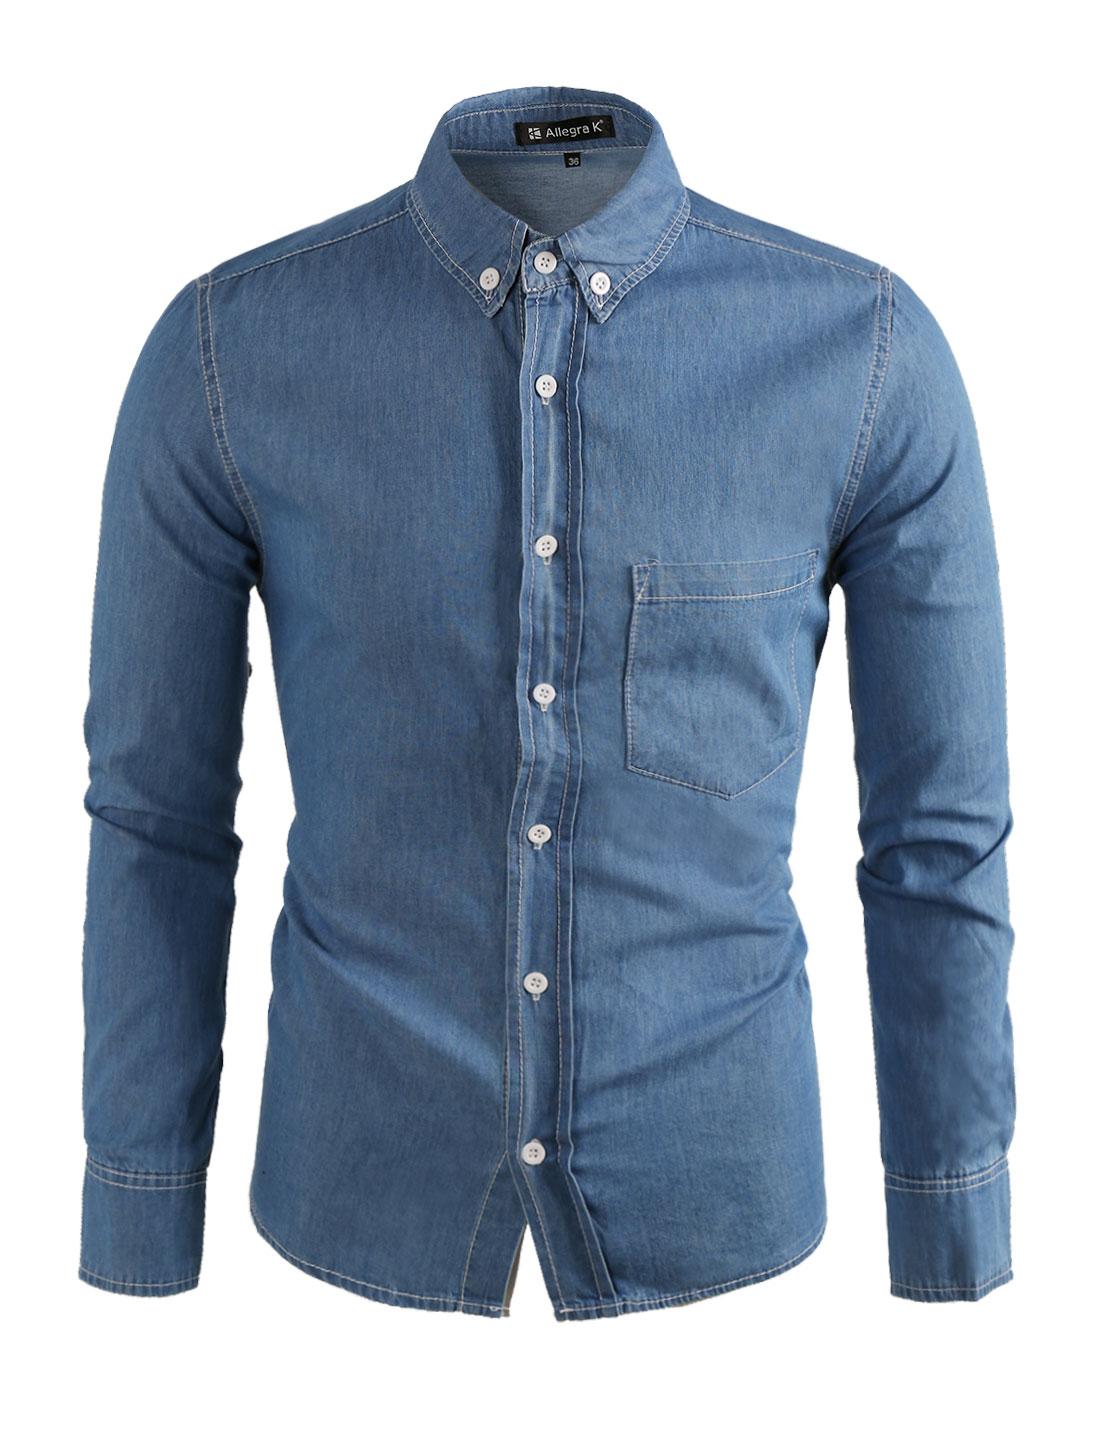 Men Button Up One Chest Pocket Long Sleeves Denim Shirt Blue M